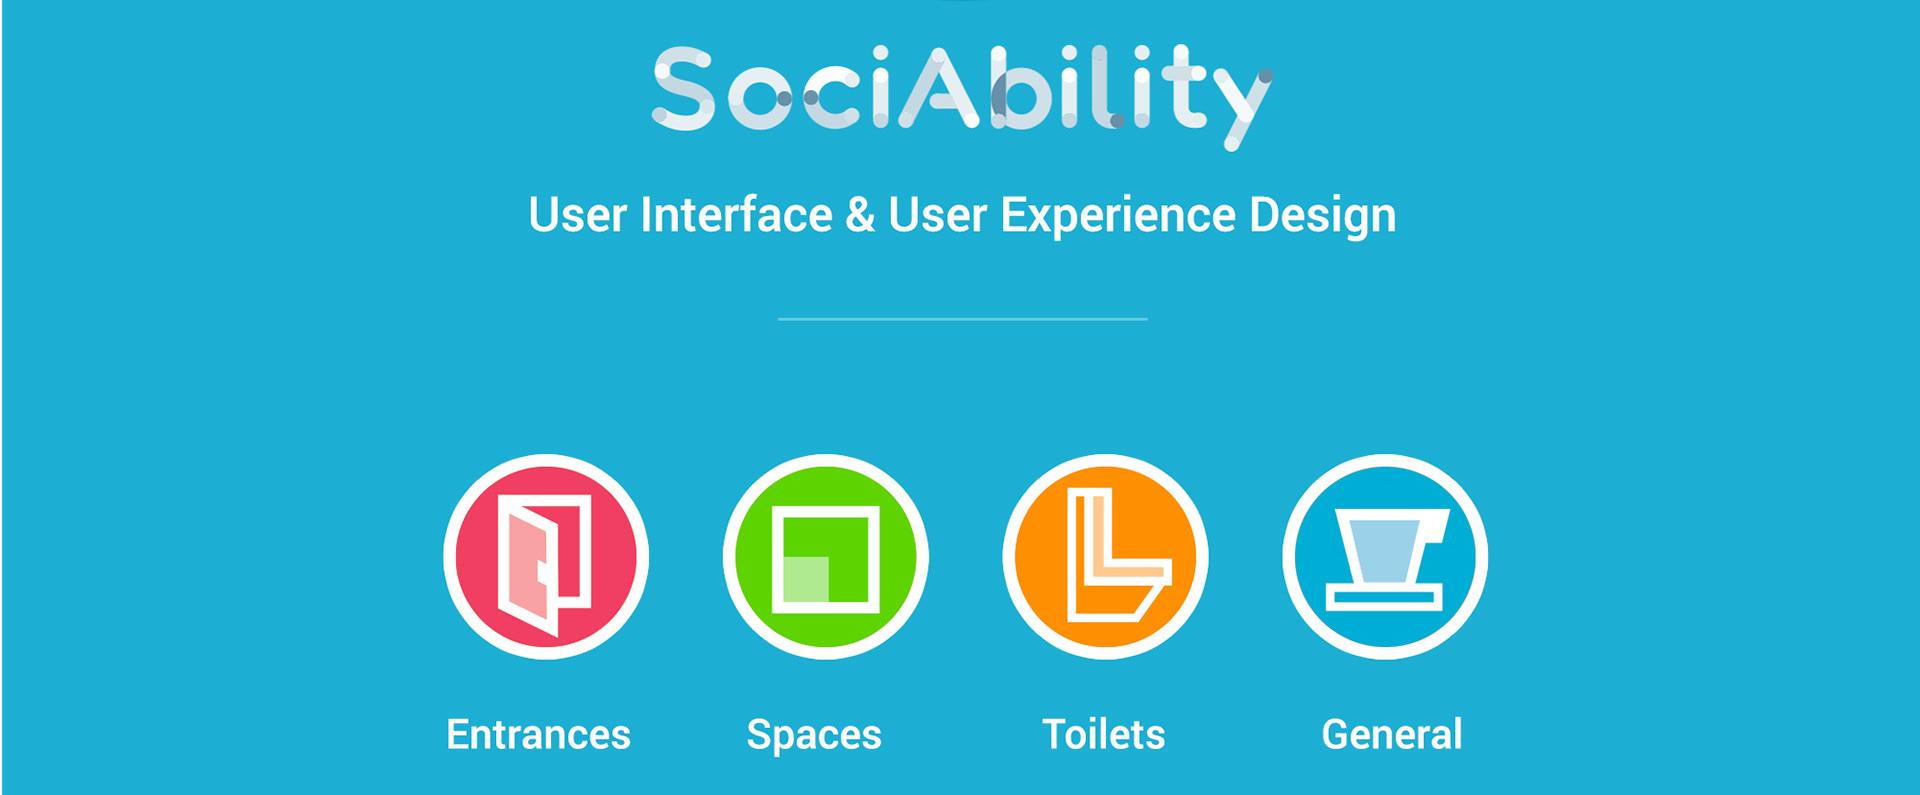 sociability project 2